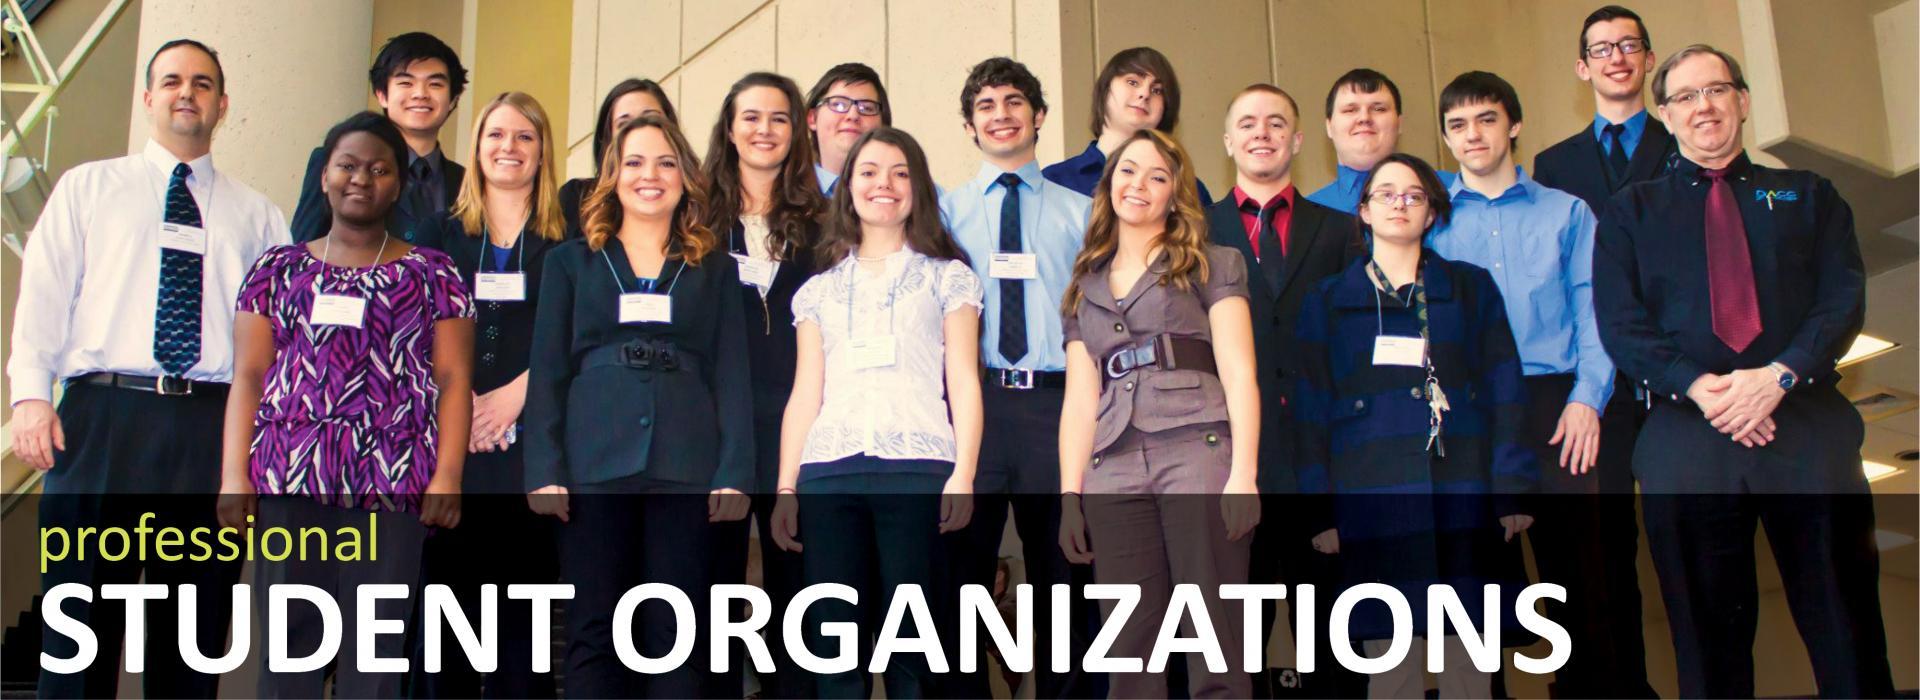 Professional Student Organizations Banner